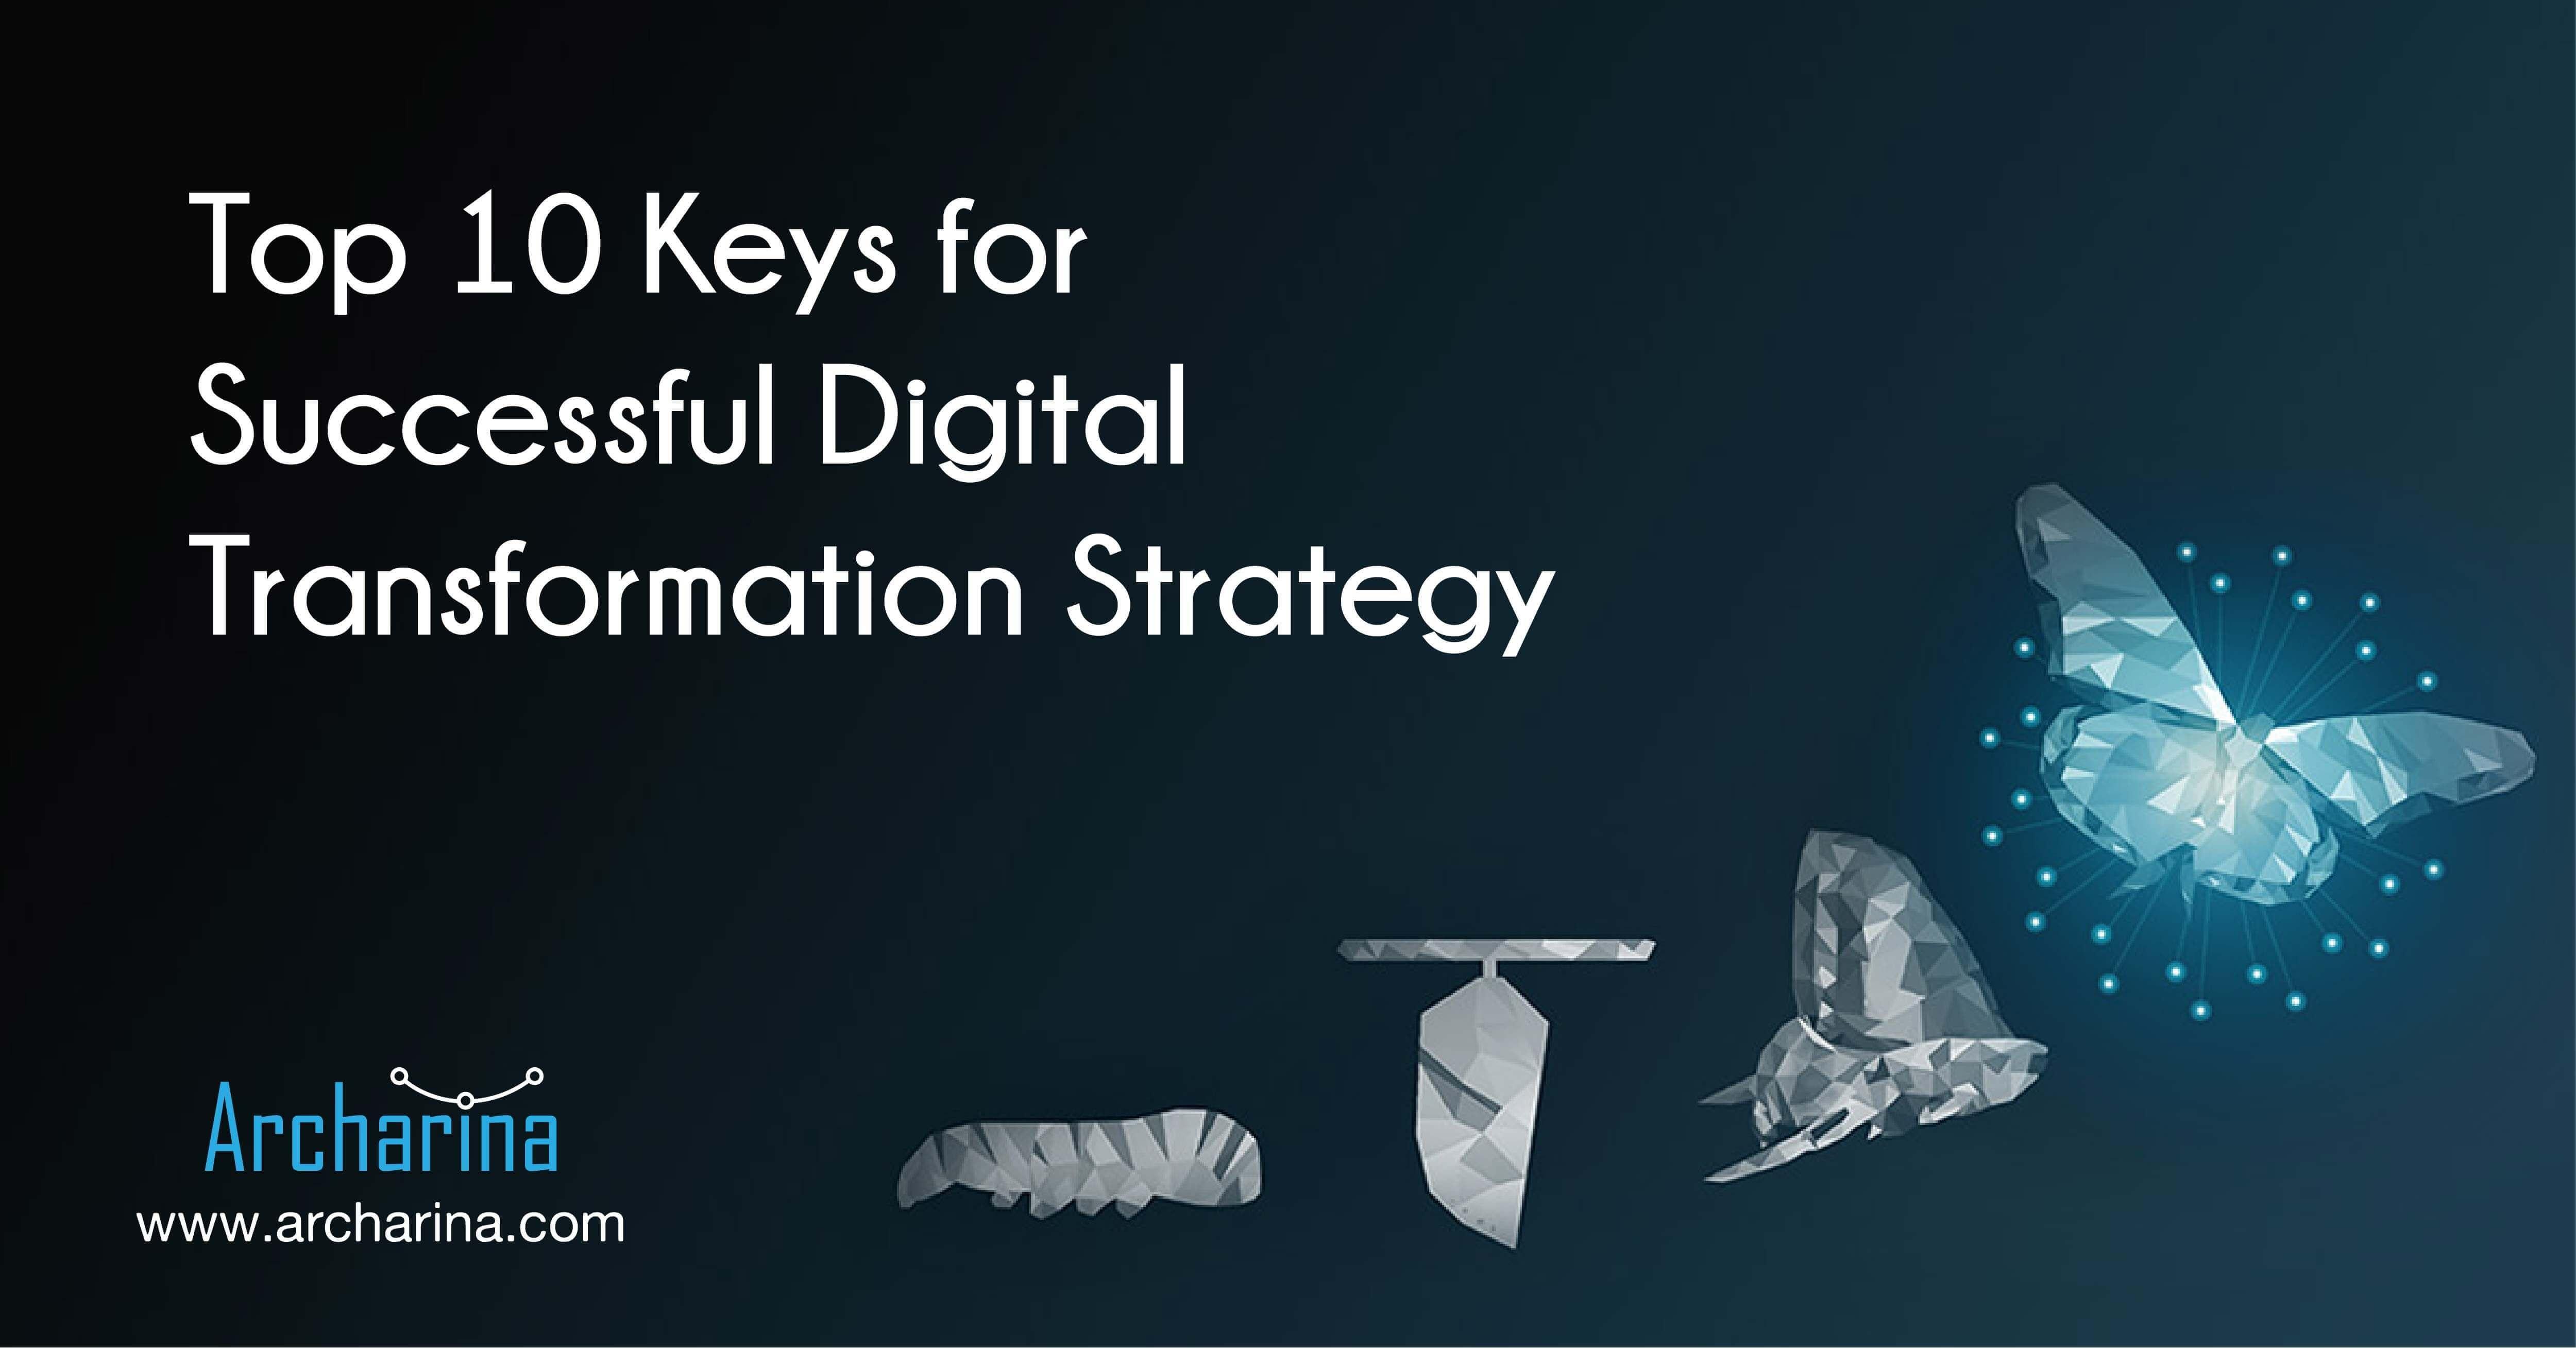 Top 10 Keys for Successful Digital Transformation Strategy